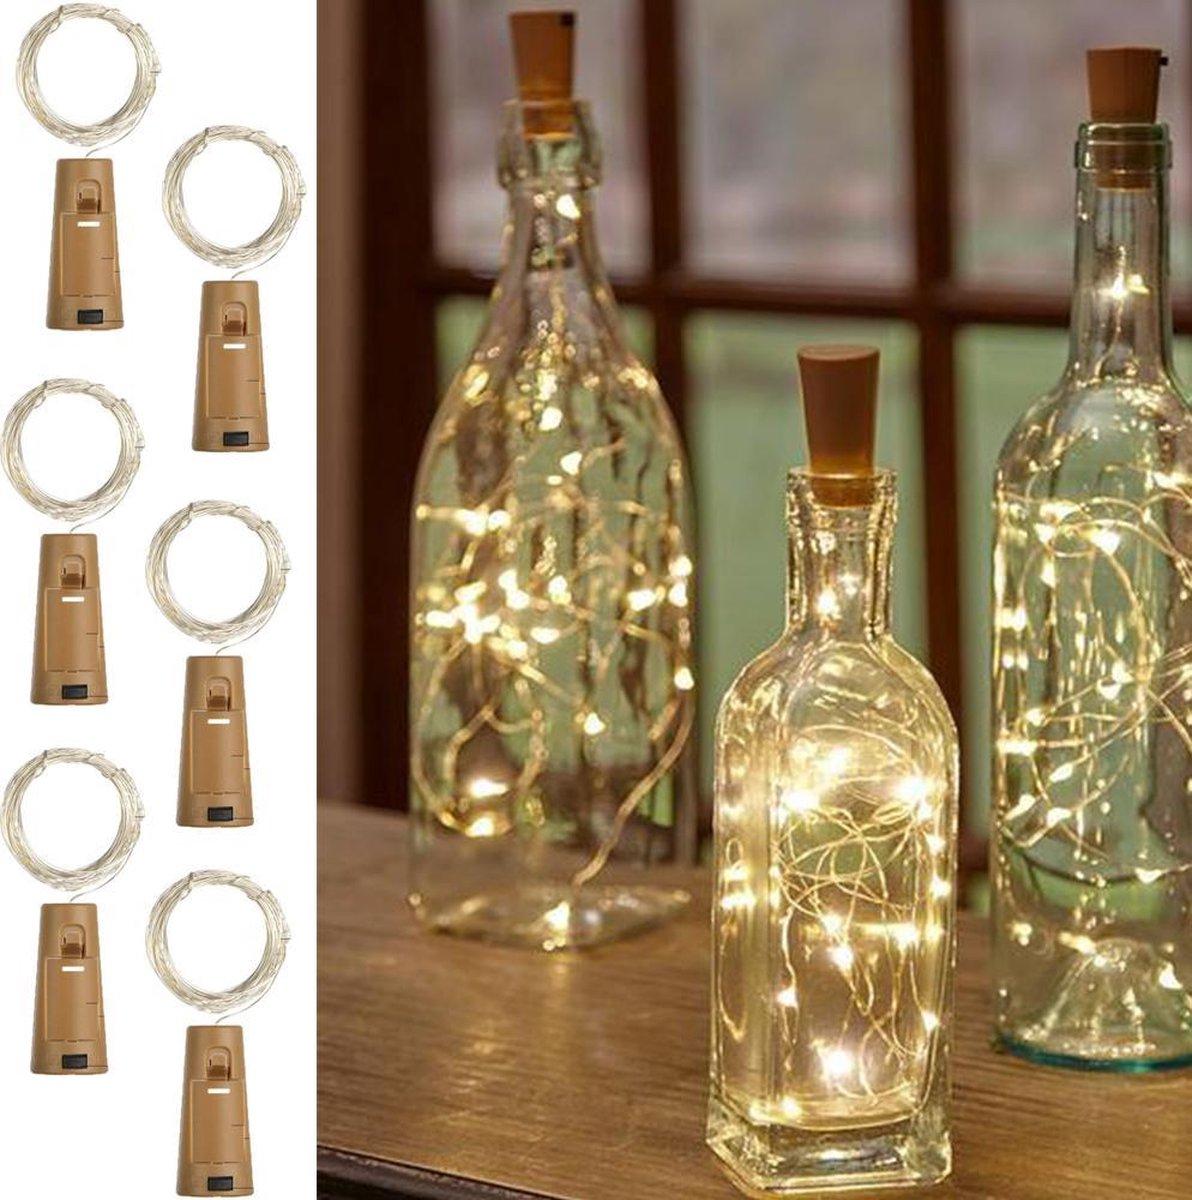 Made4Home  - Kurk met LED   Flesverlichting   Sfeerverlichting   Flessenlamp   Wijnfles   Lichtkurk